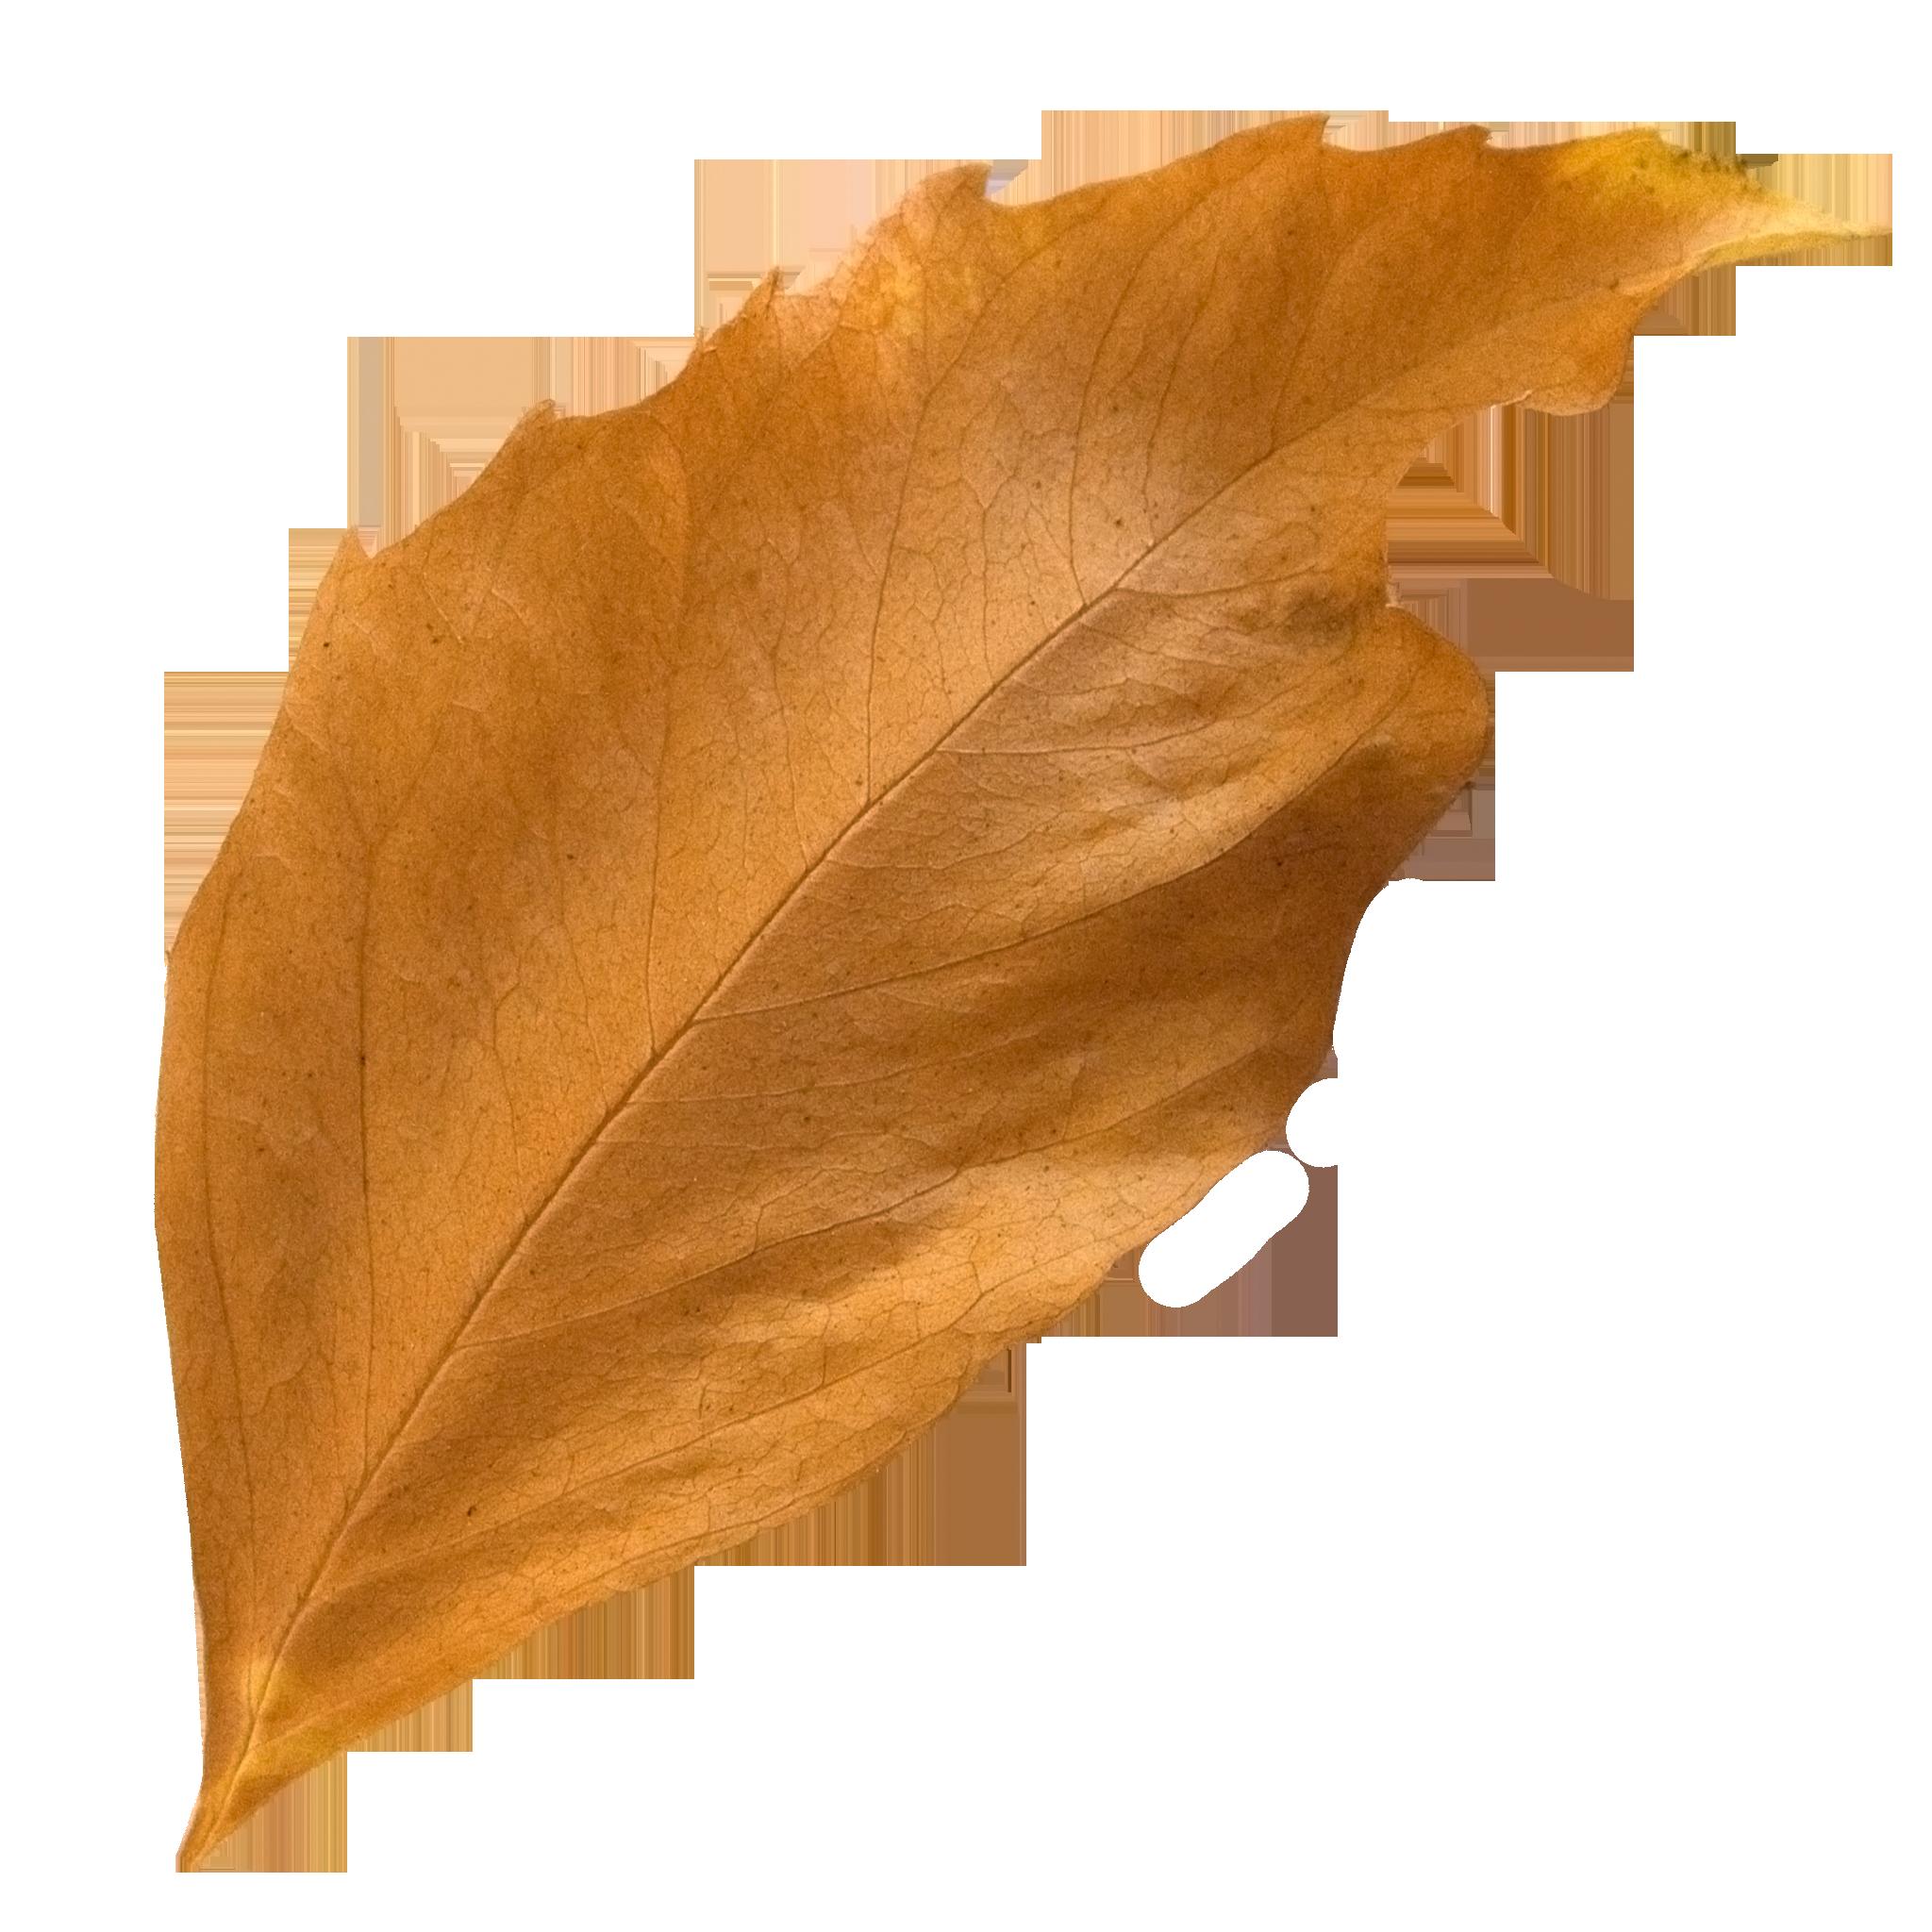 Curled Fall Leaf.png